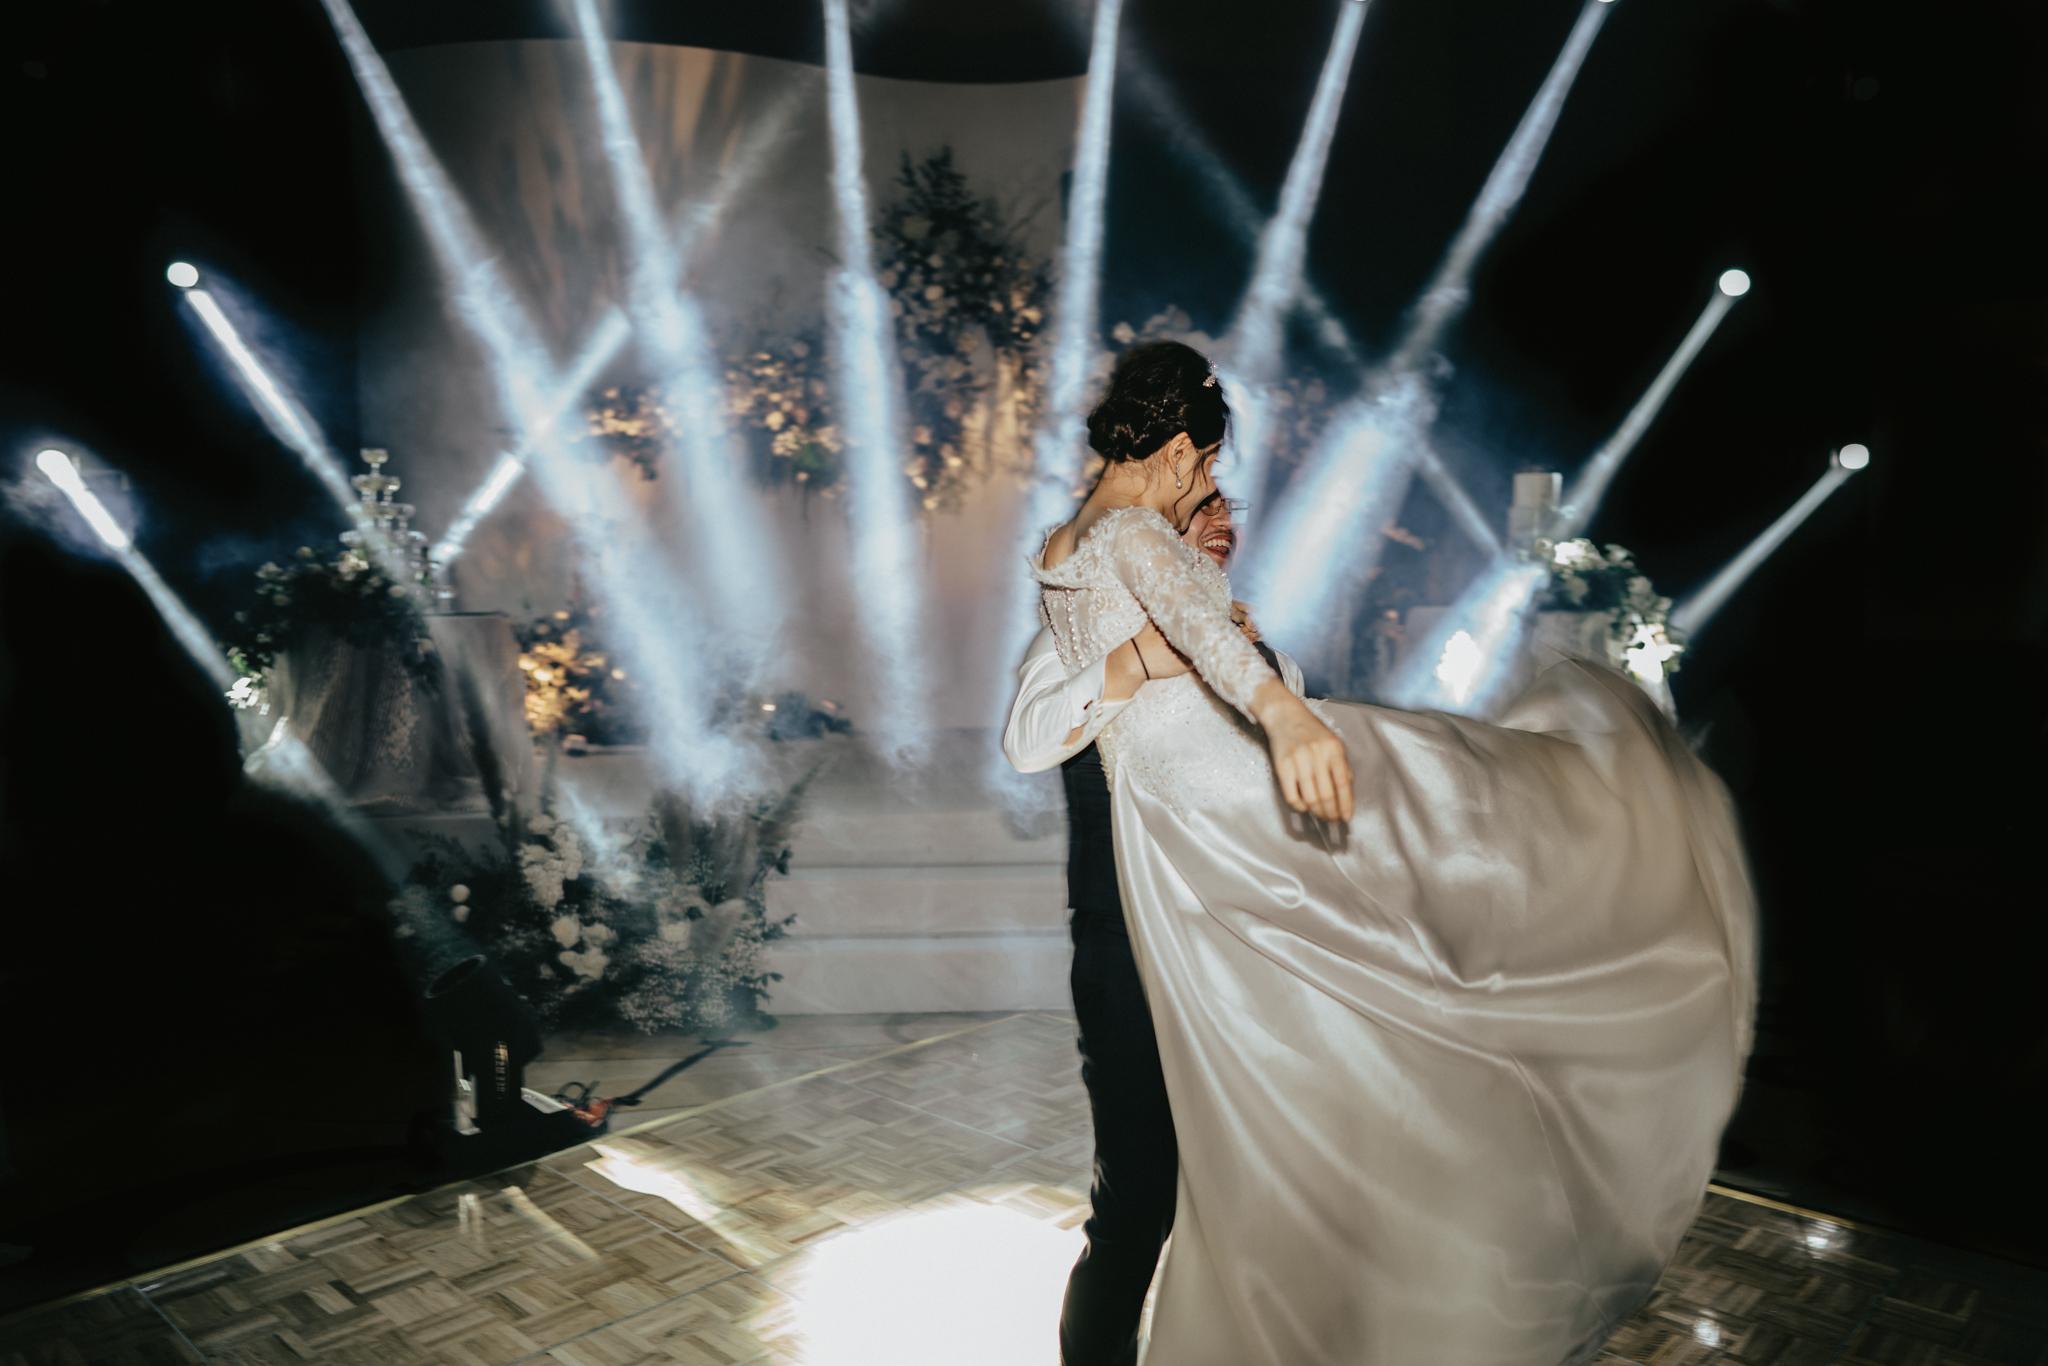 JWMarriott Ha Noi Intimate Wedding of Trang Hi well captured by Hipster Wedding Vietnam Wedding Photographer-36345.jpg